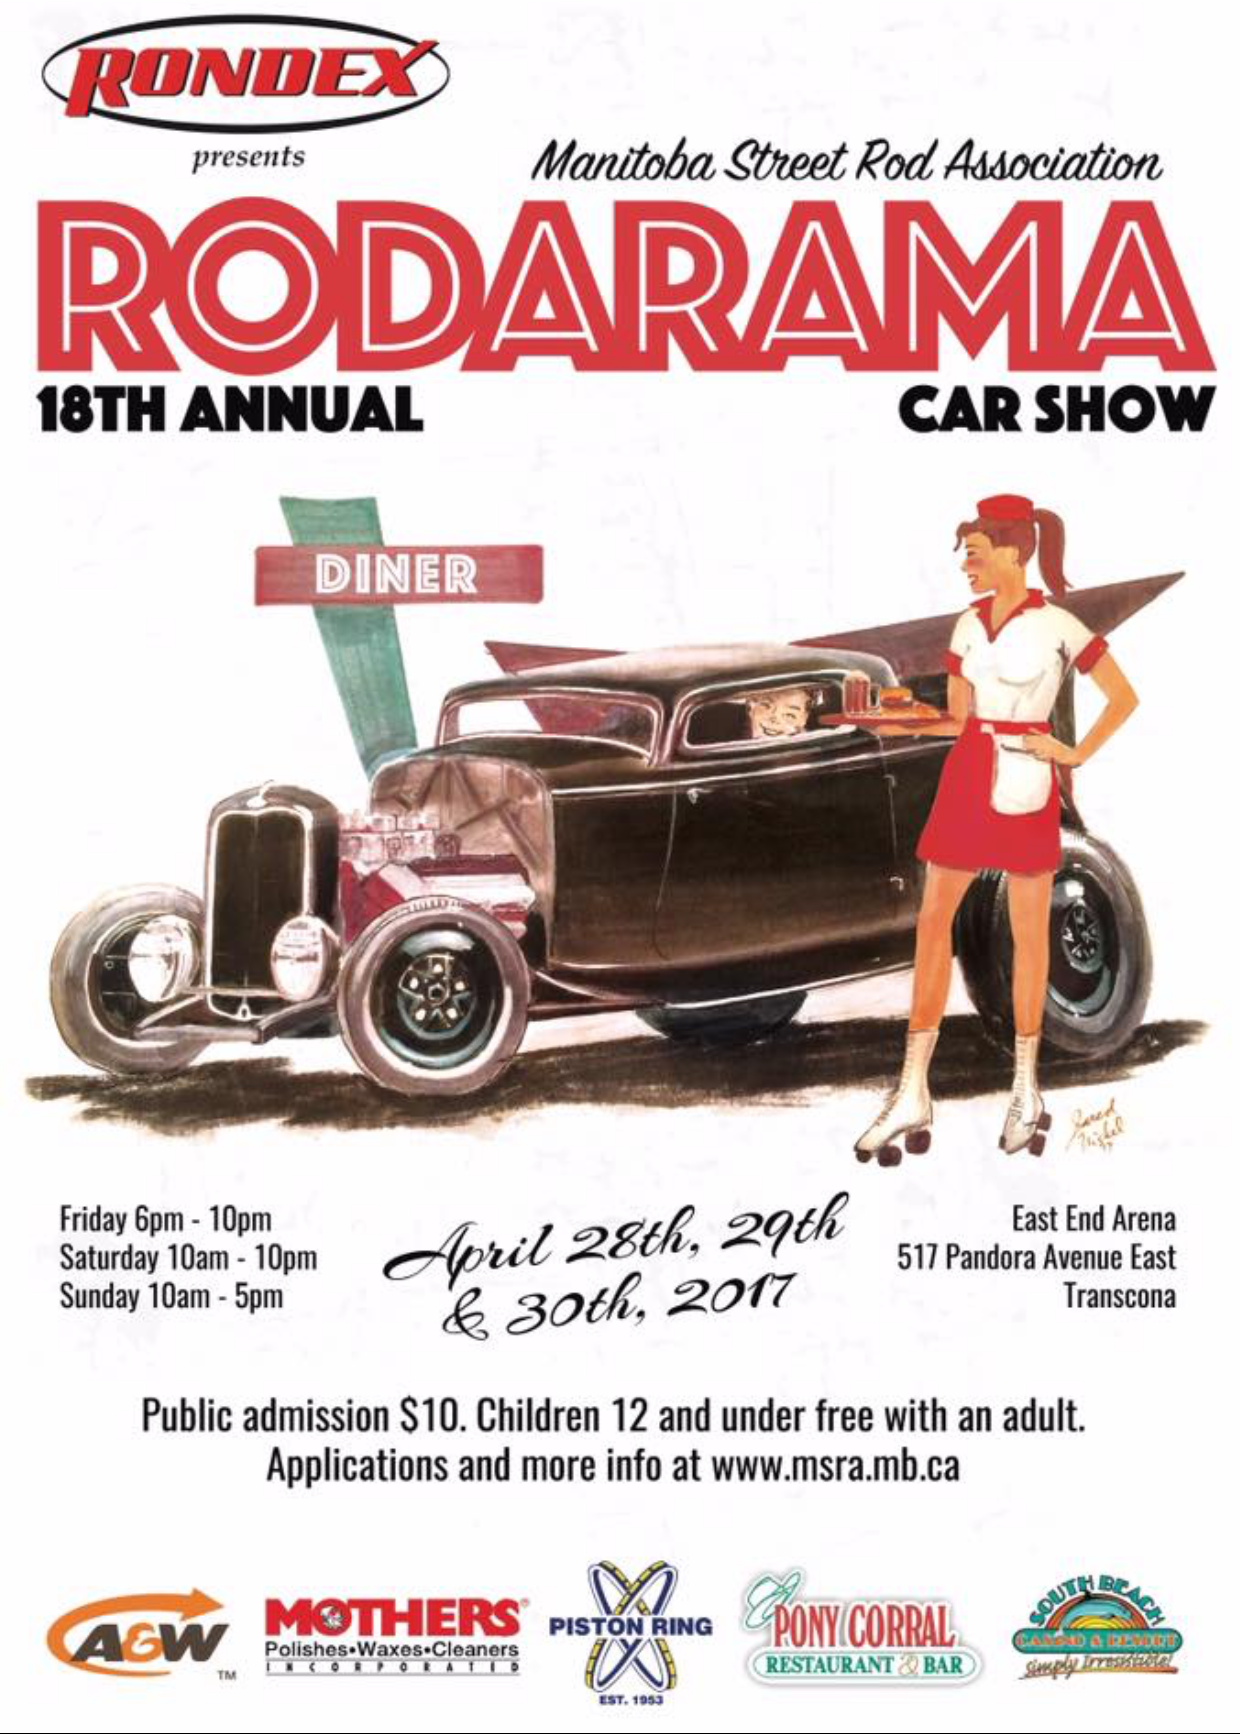 18th Annual Rodarama Classic Car Show in Winnipeg - Rondex